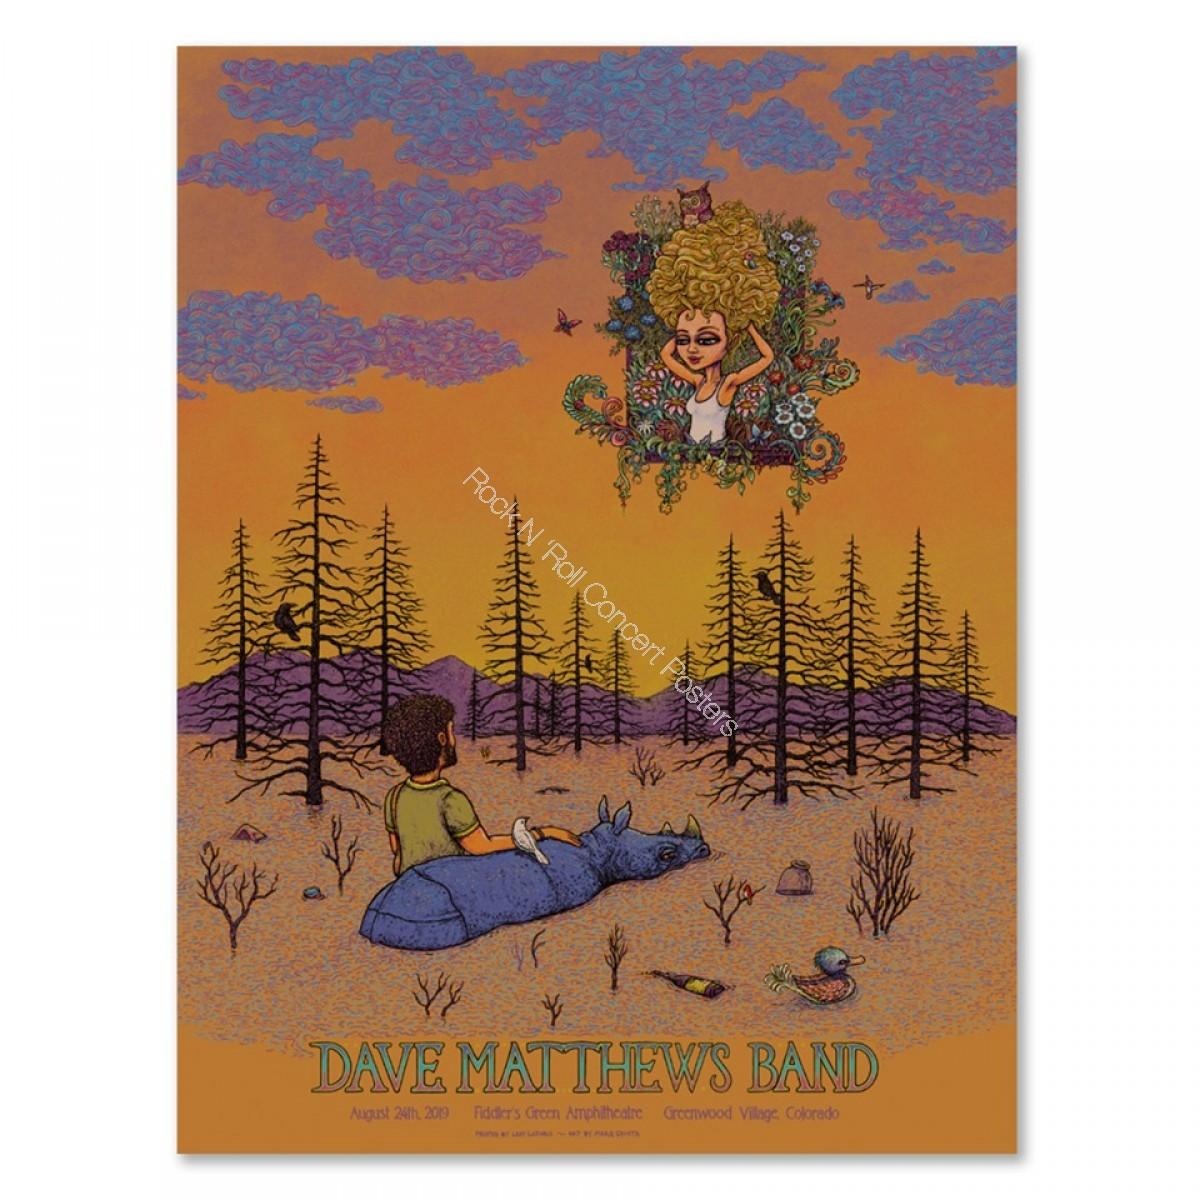 Dave Matthews Band Fiddler's Green Amphitheatre Greenwood Village Colorado 8/24/19 Official Screen Print